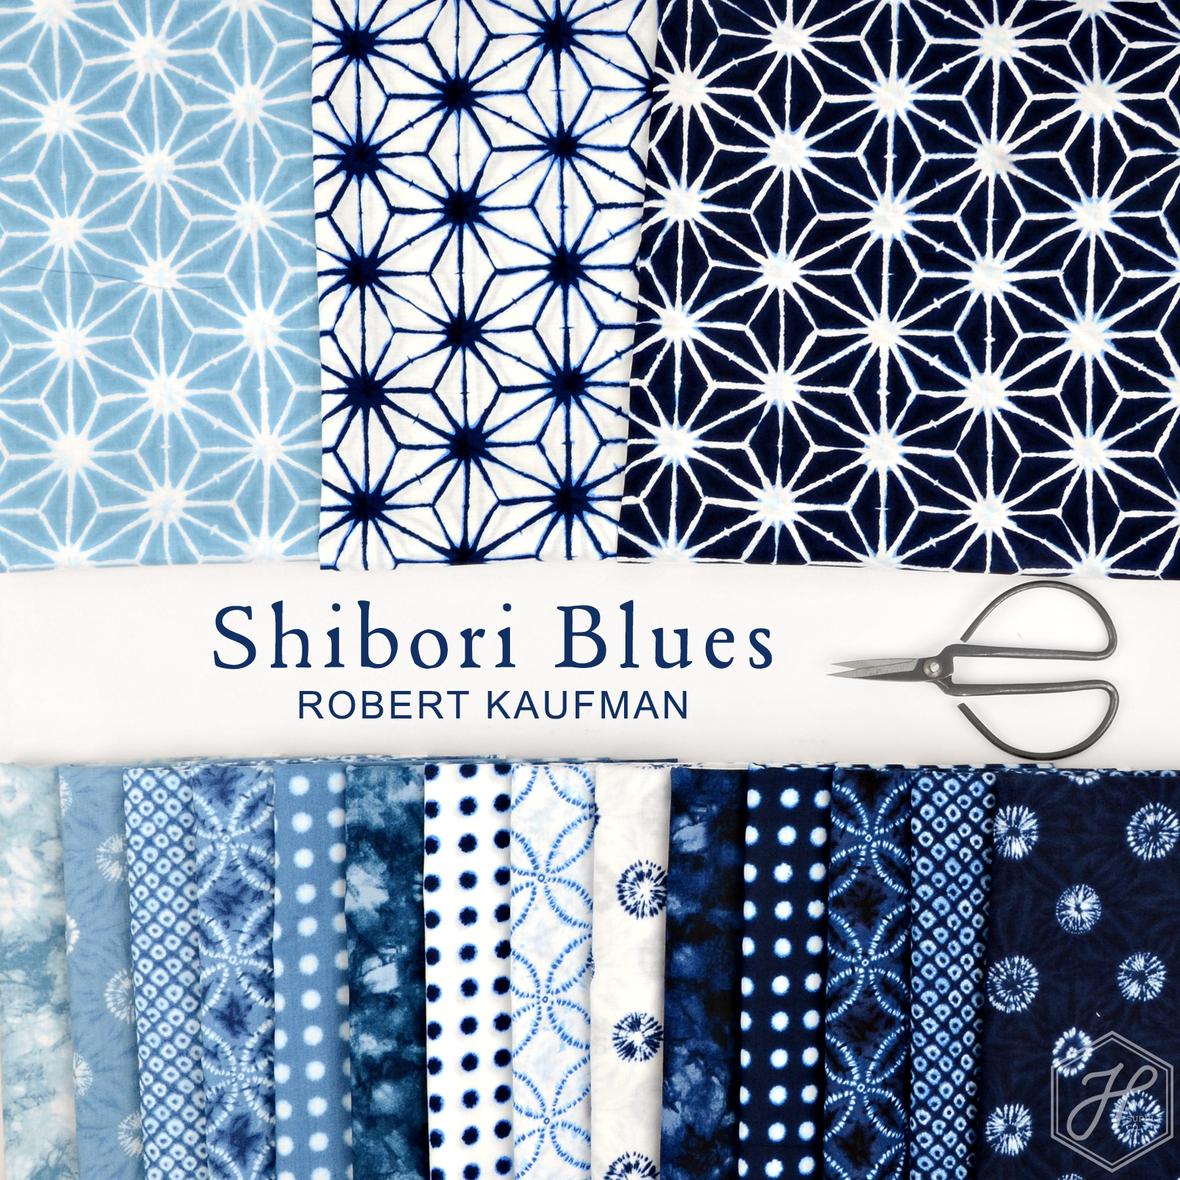 Shibori Blues Robert Kaufman at Hawthorne Supply Co